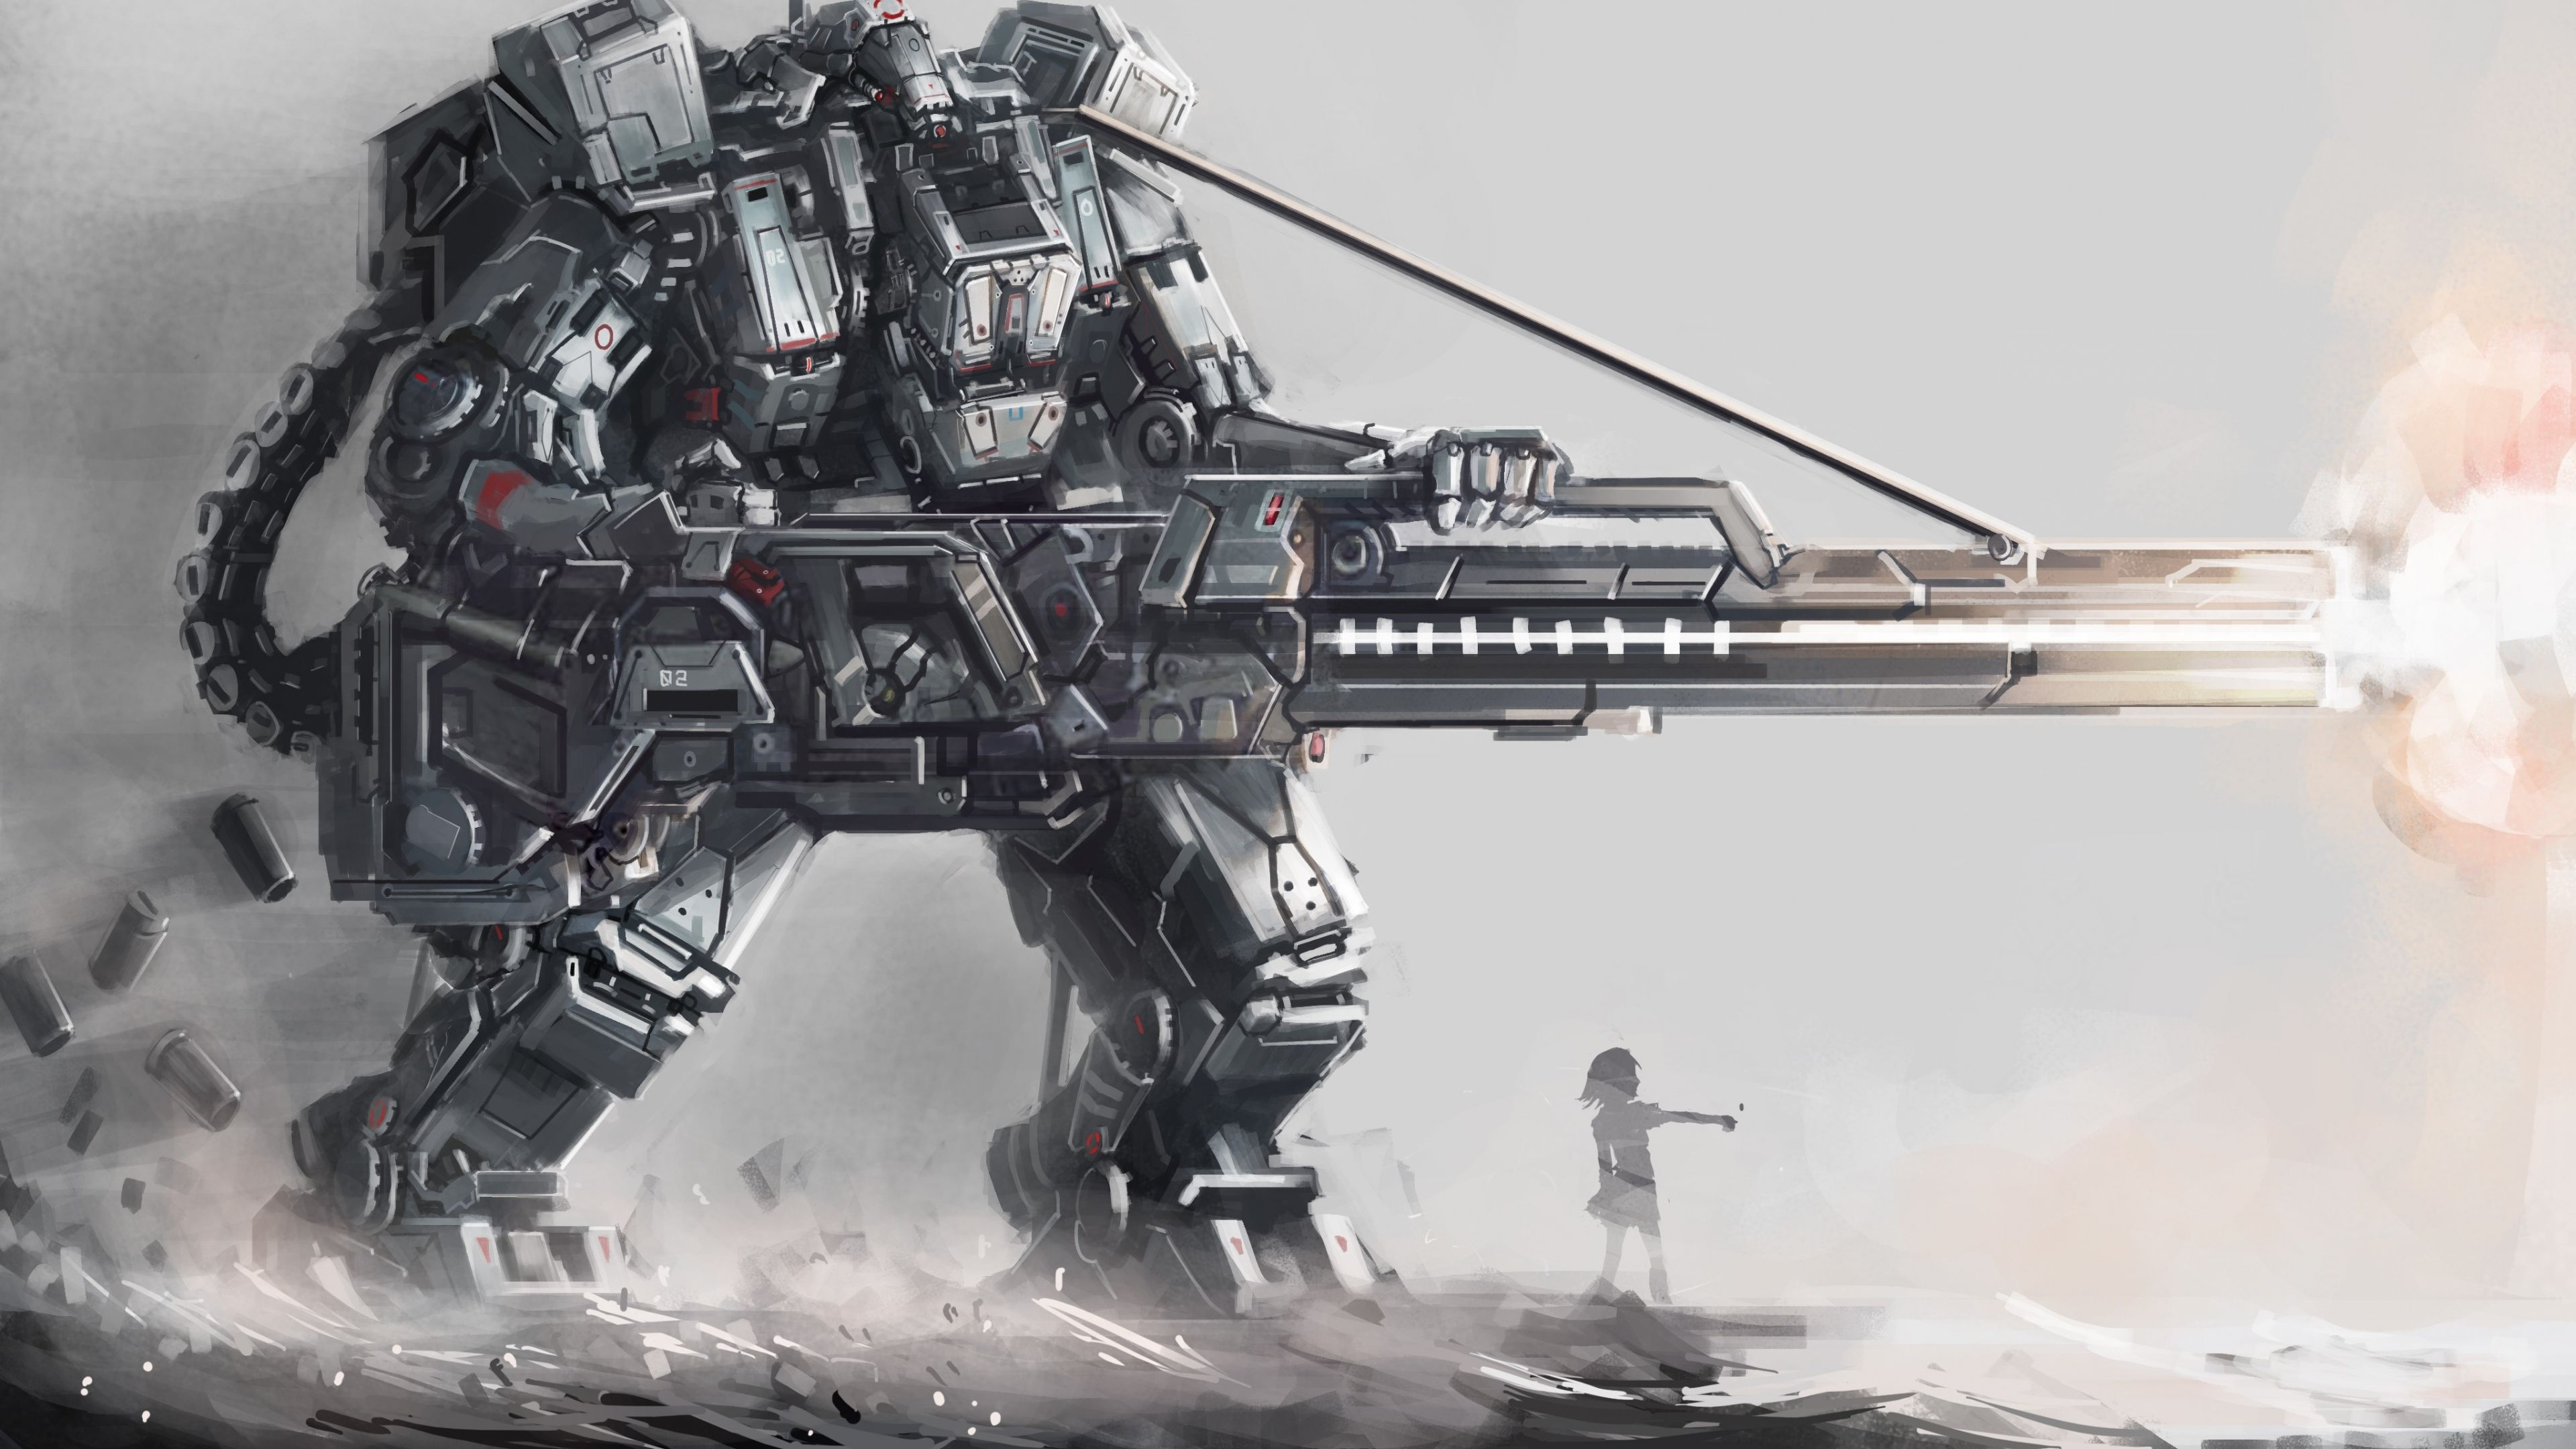 3840x2160 Wallpaper Art Osama Robot Giant Guns Silhouette Girl Mecha Mech Giant Robots